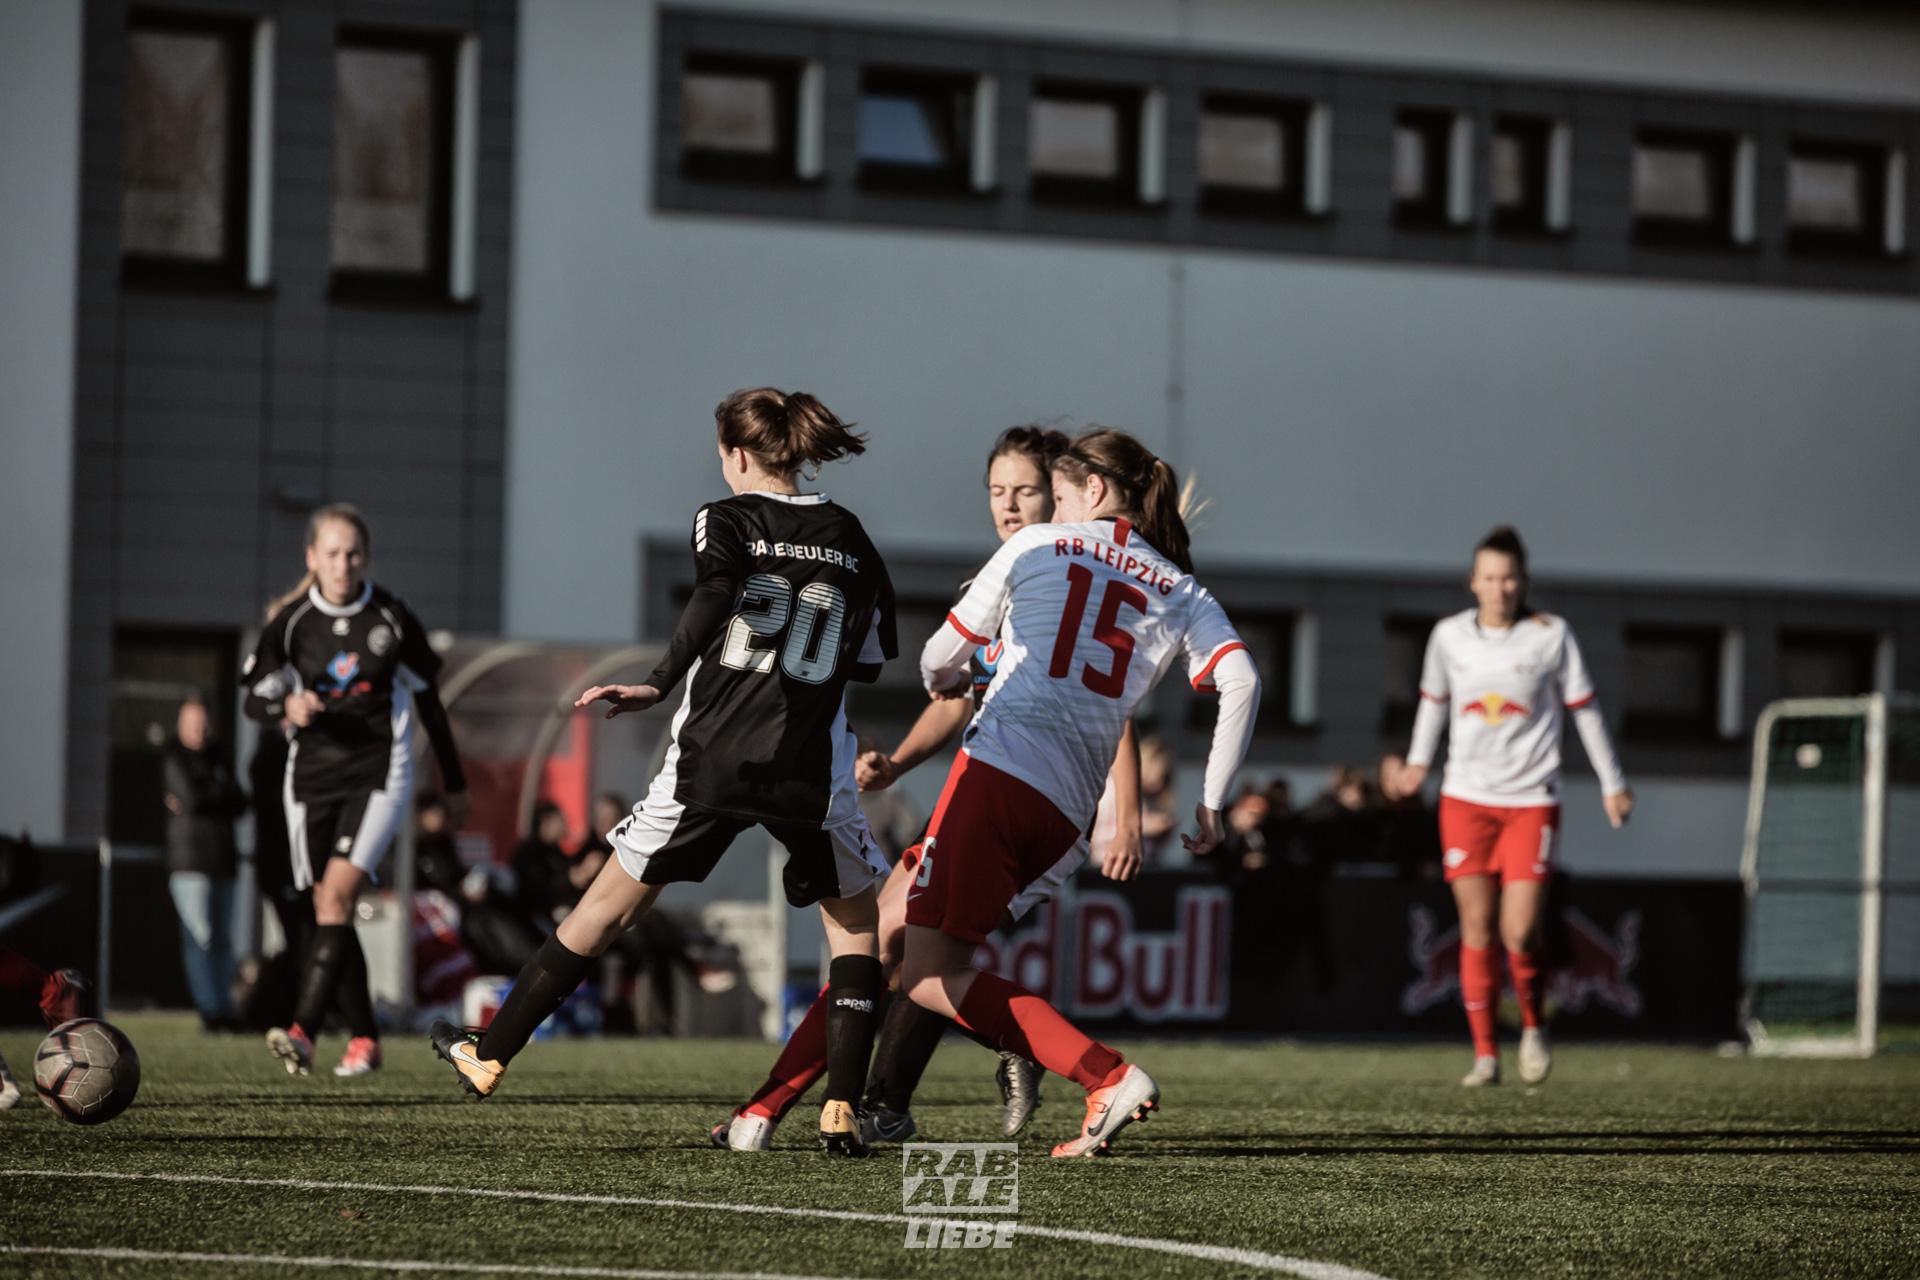 Landesliga Frauen: RB Leipzig II -vs- Radebeuler BC